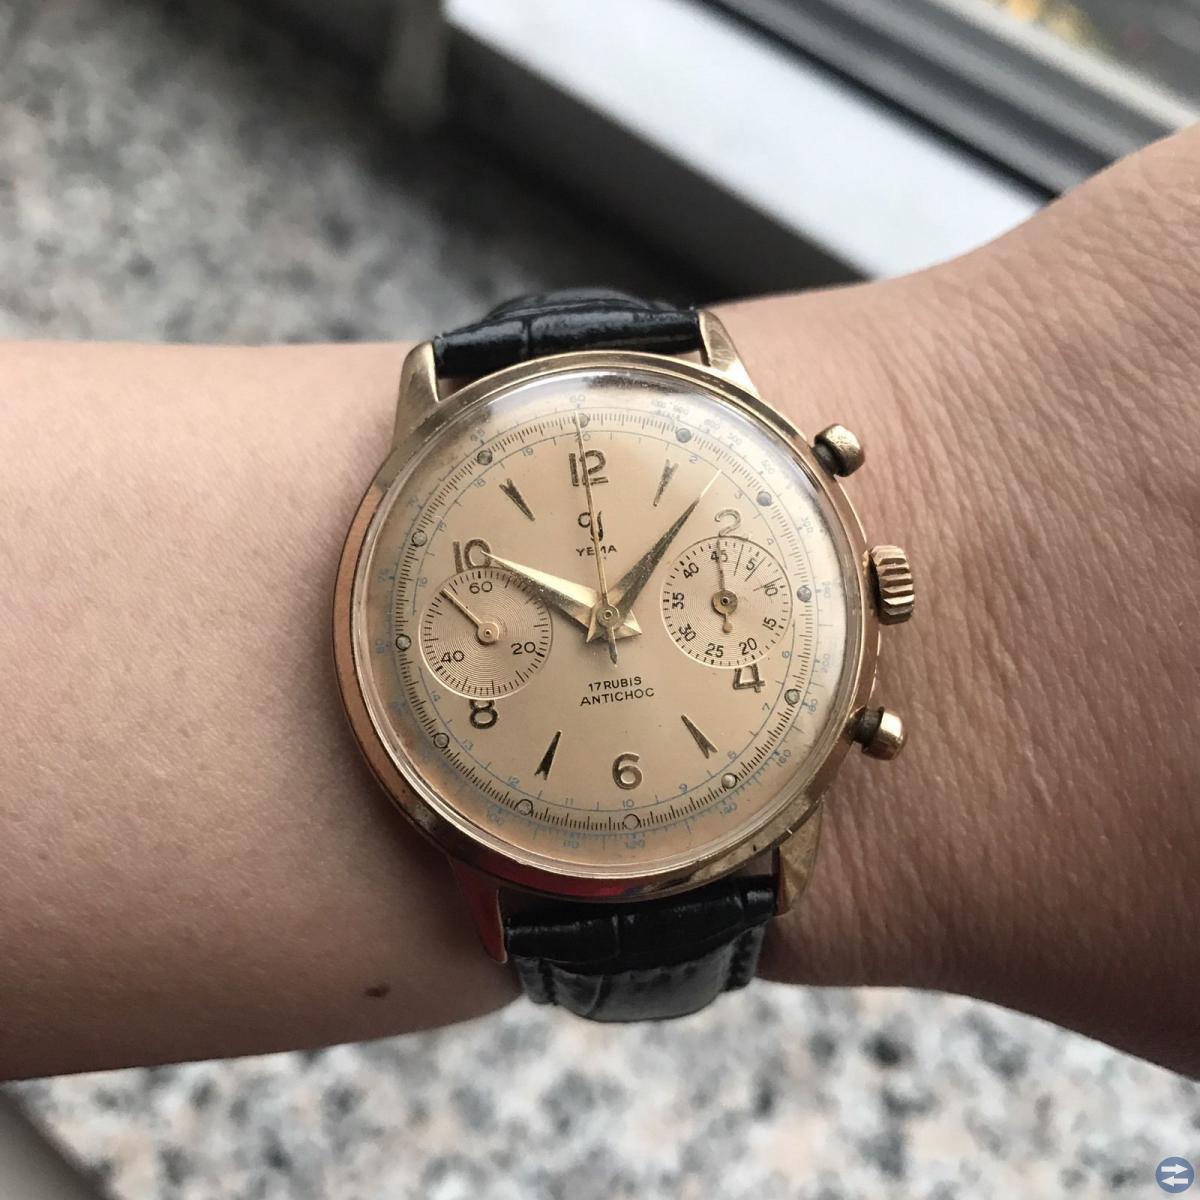 Sökessss gamla mekanisk kronograf klockor